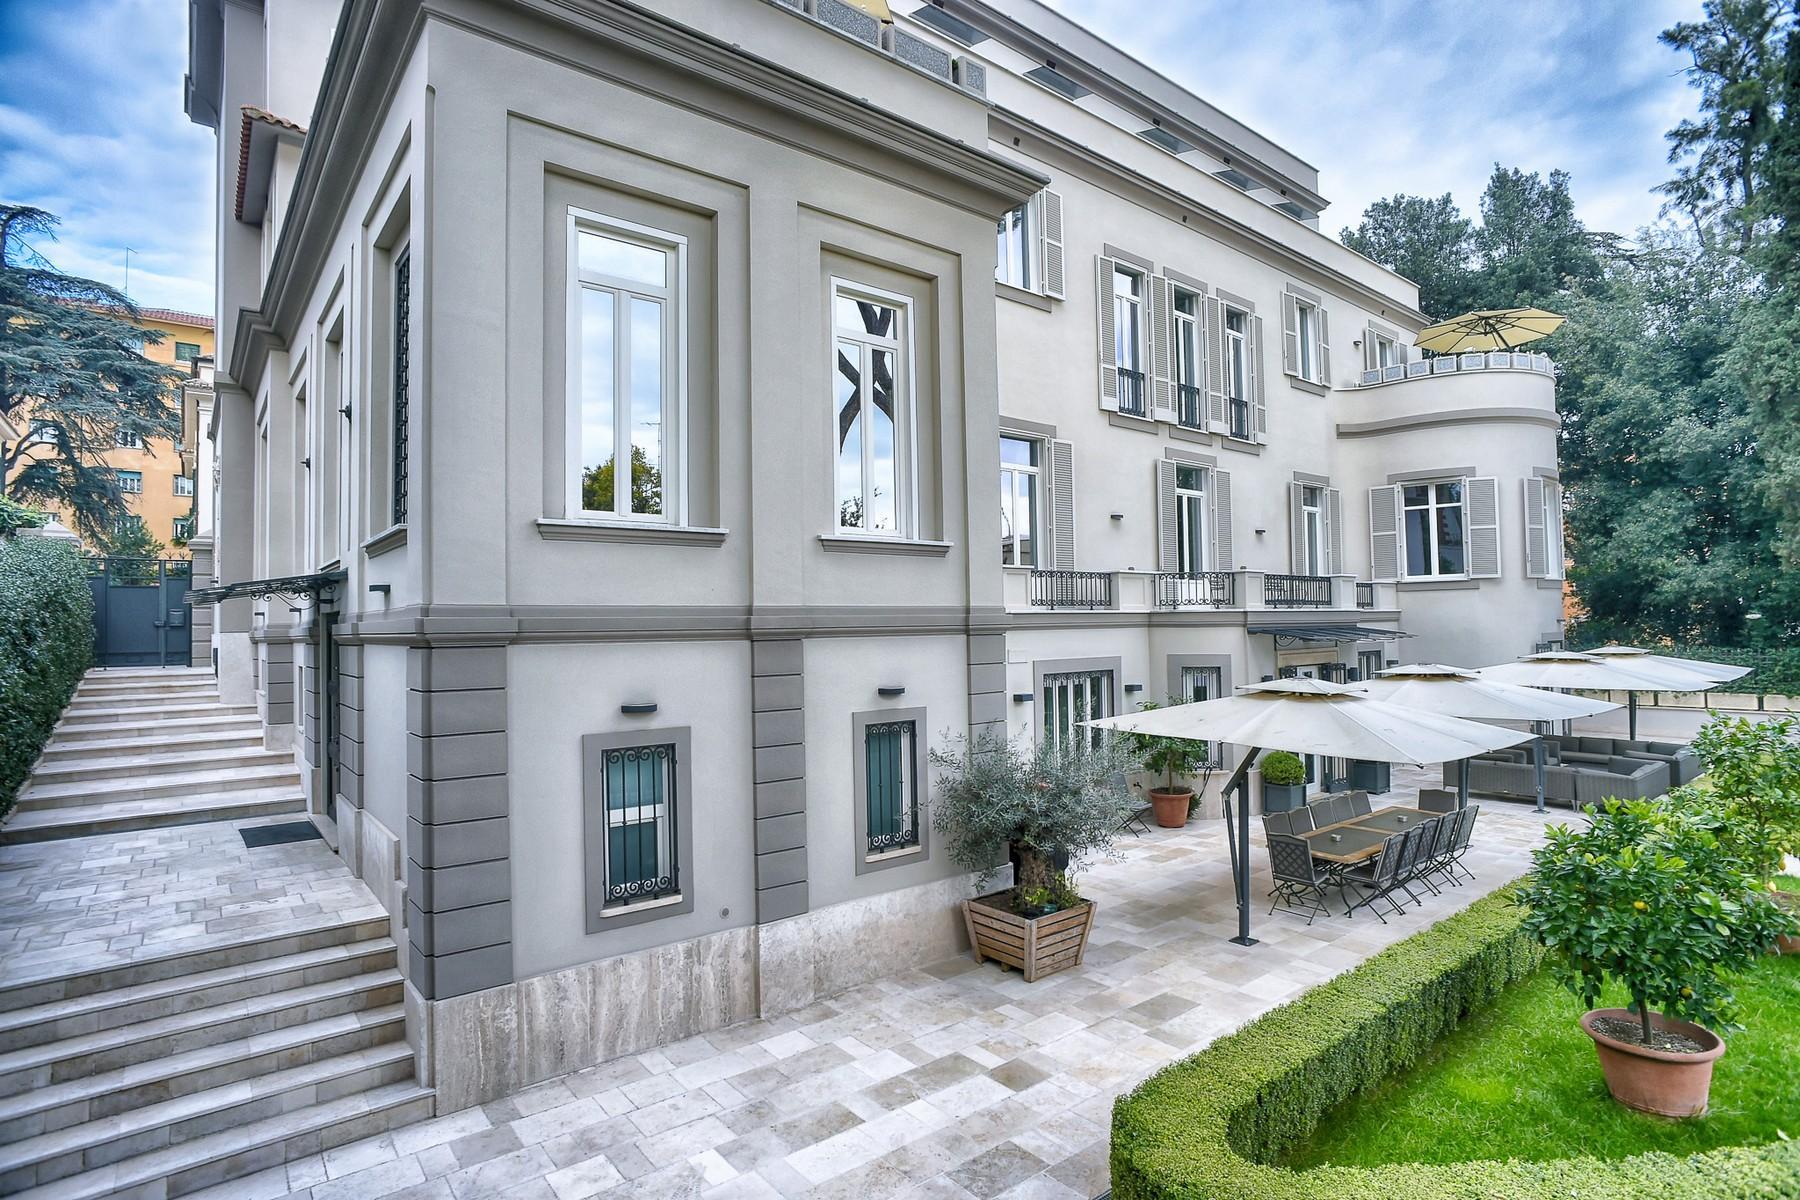 Villa Calandrelli, Charme und Stil im grünen Herzen Roms - 4